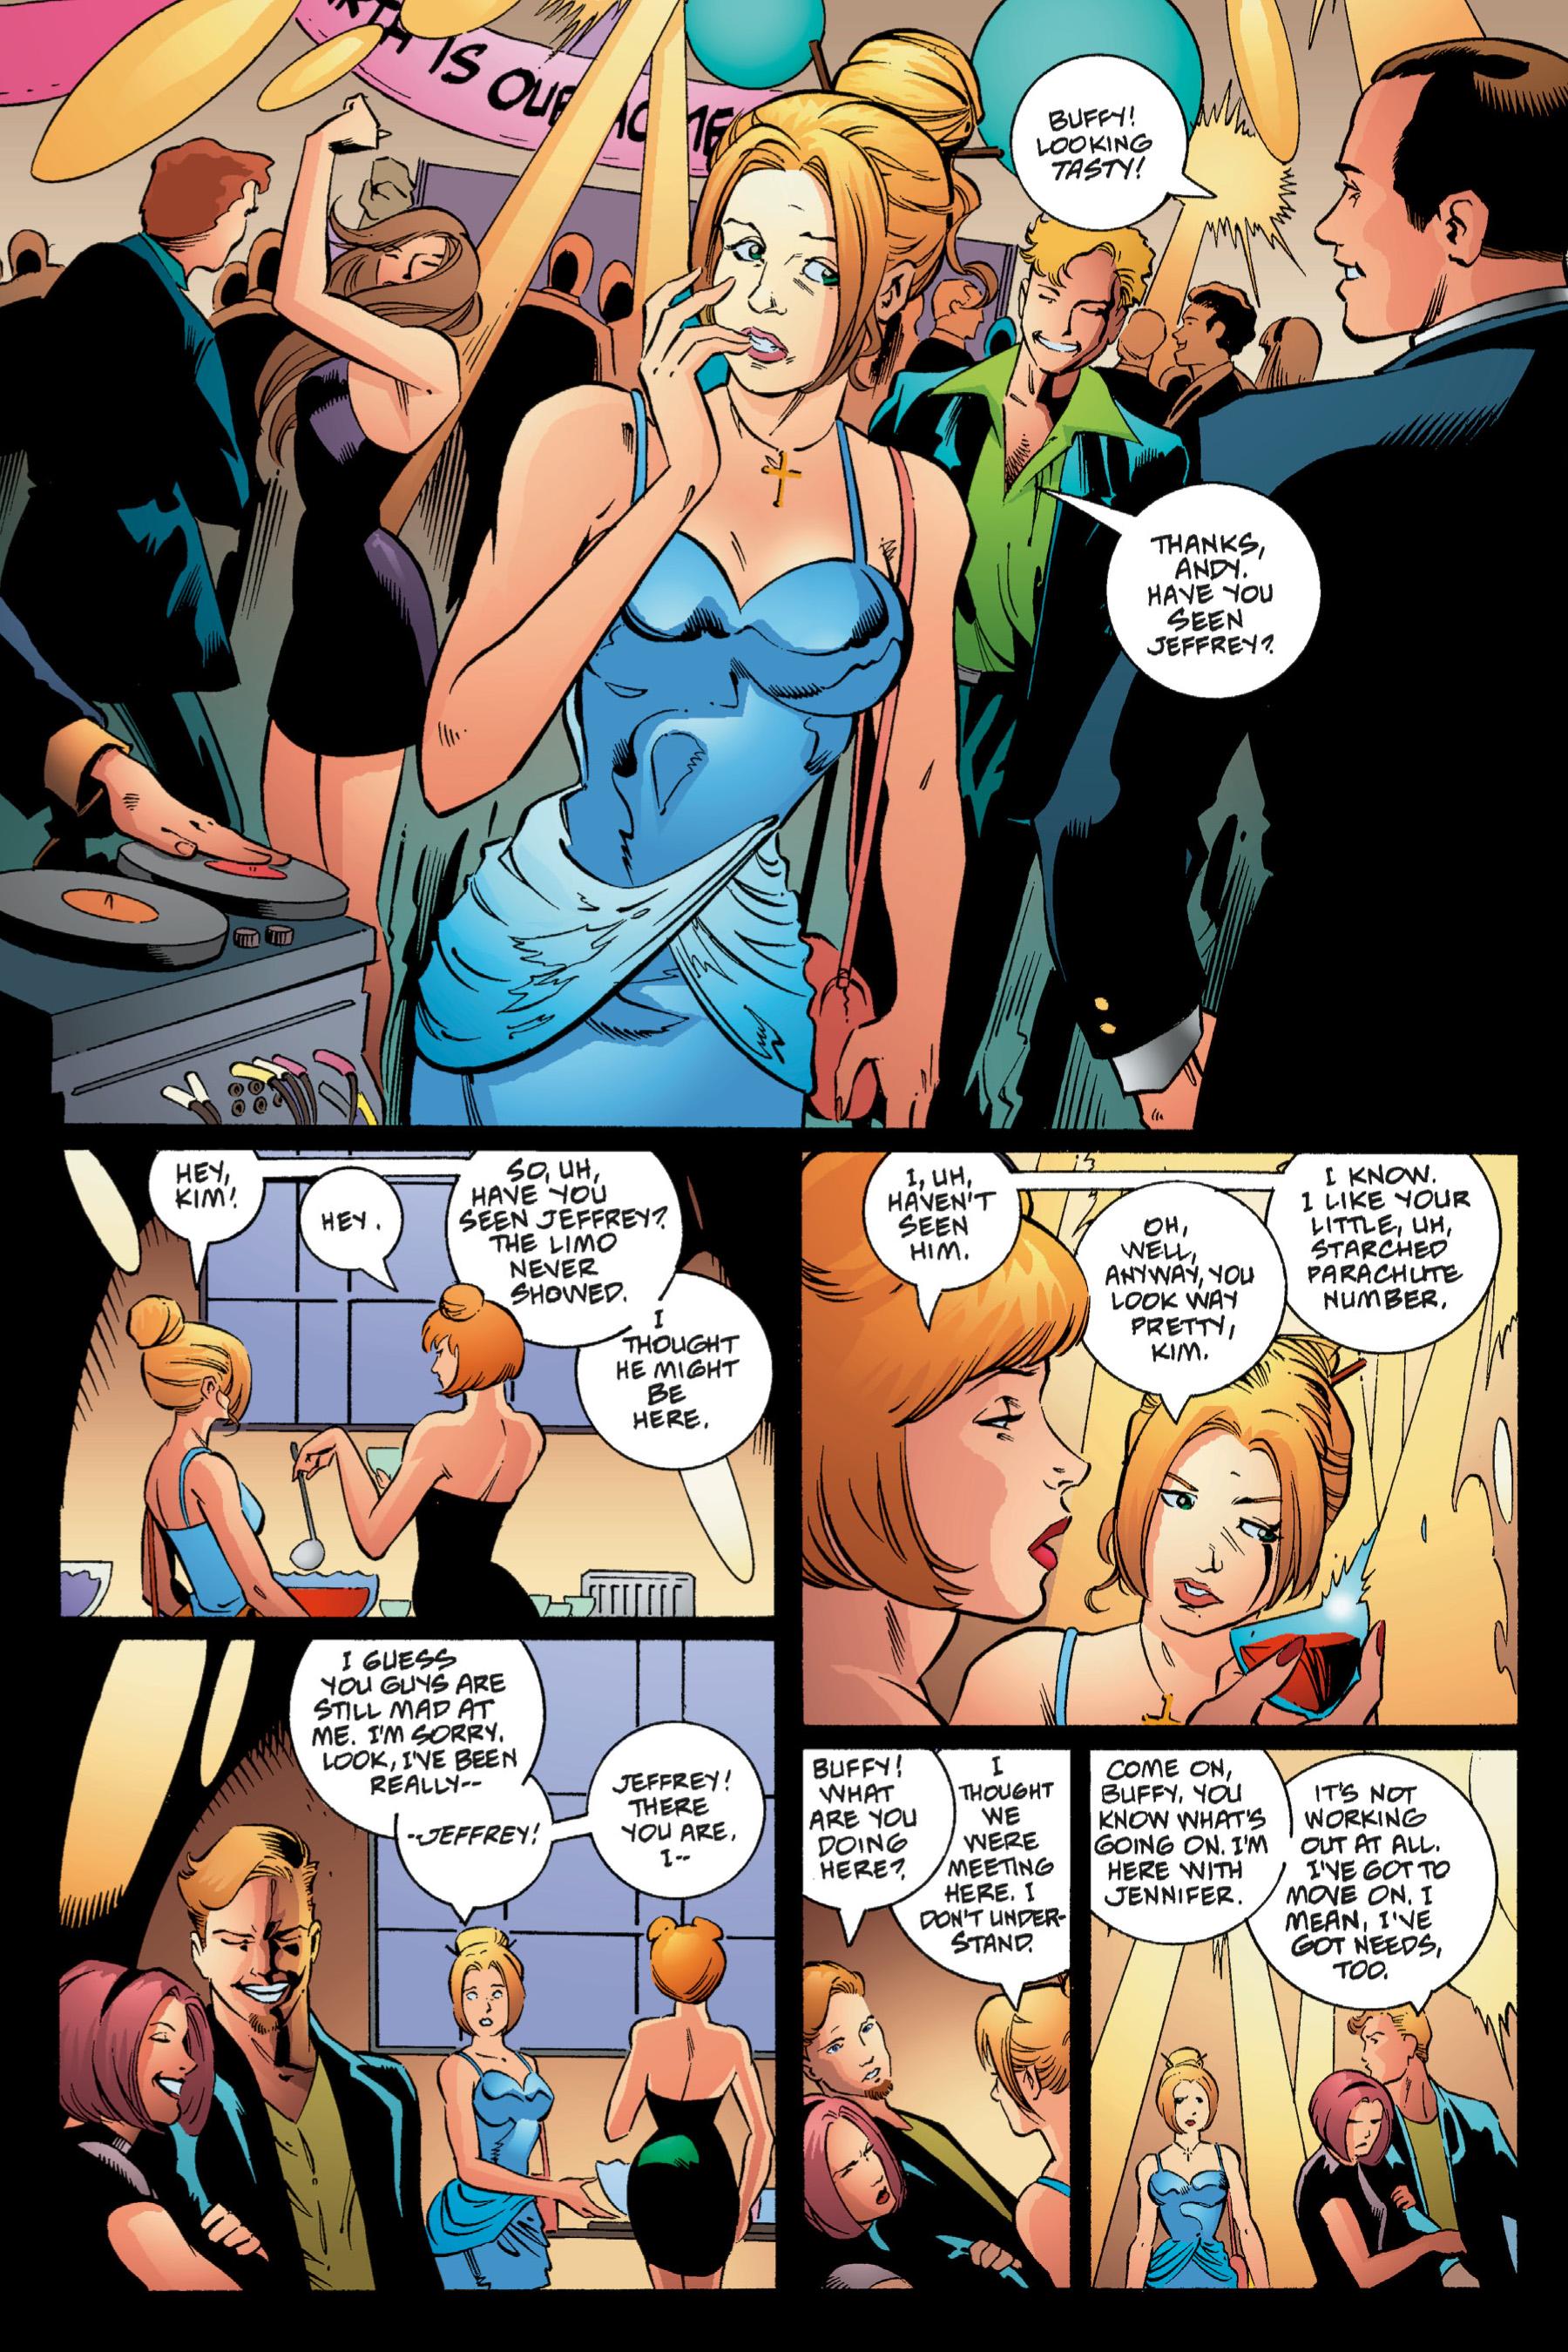 Read online Buffy the Vampire Slayer: Omnibus comic -  Issue # TPB 1 - 86